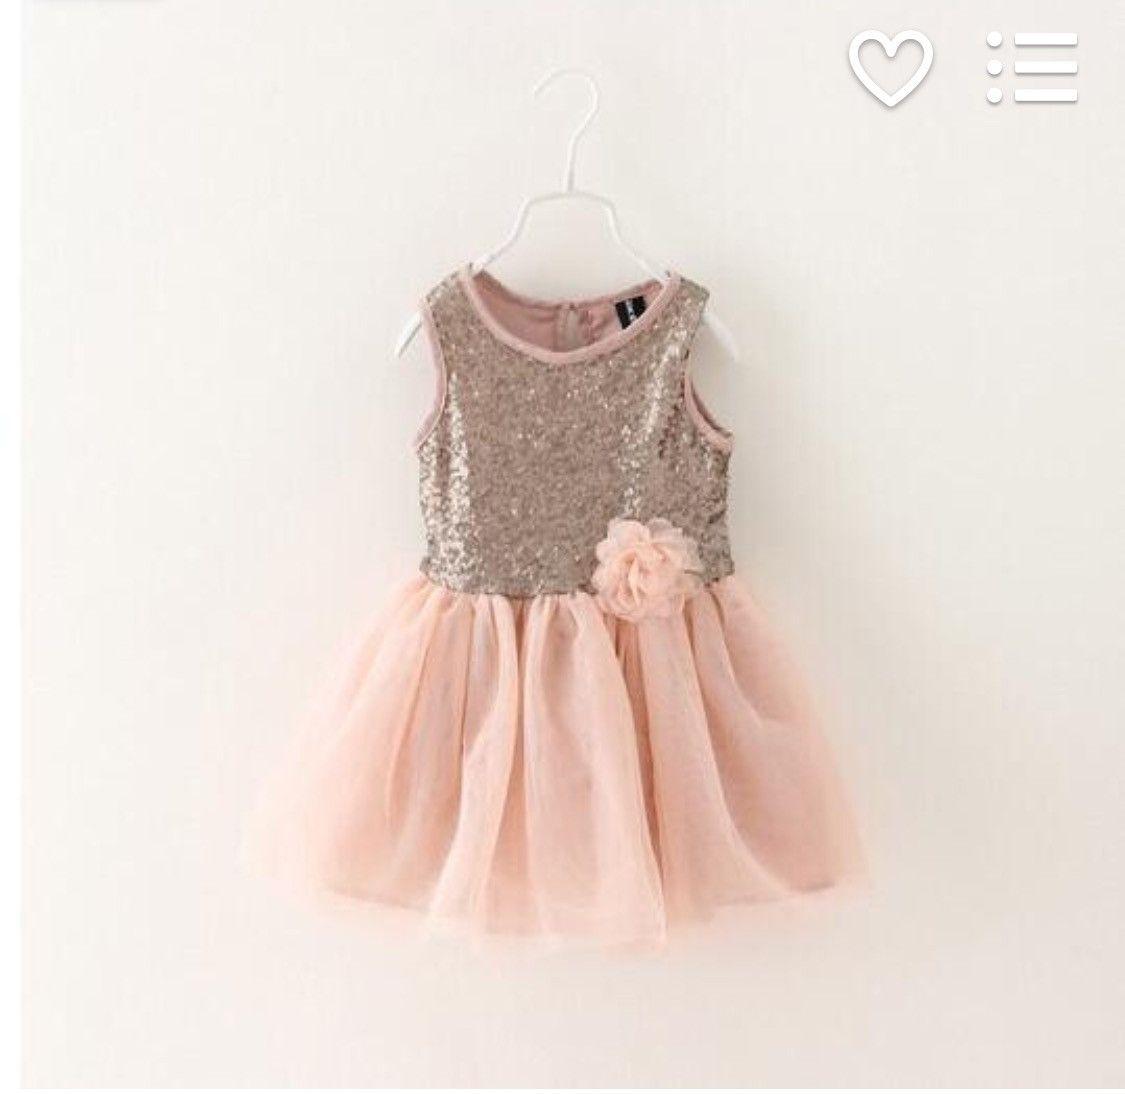 Baby girl pink sequin dress -  Marilijean Dreammarilibedroom Toddler Sequin Dress Girl Easter Dress Tulle Dress Birthday